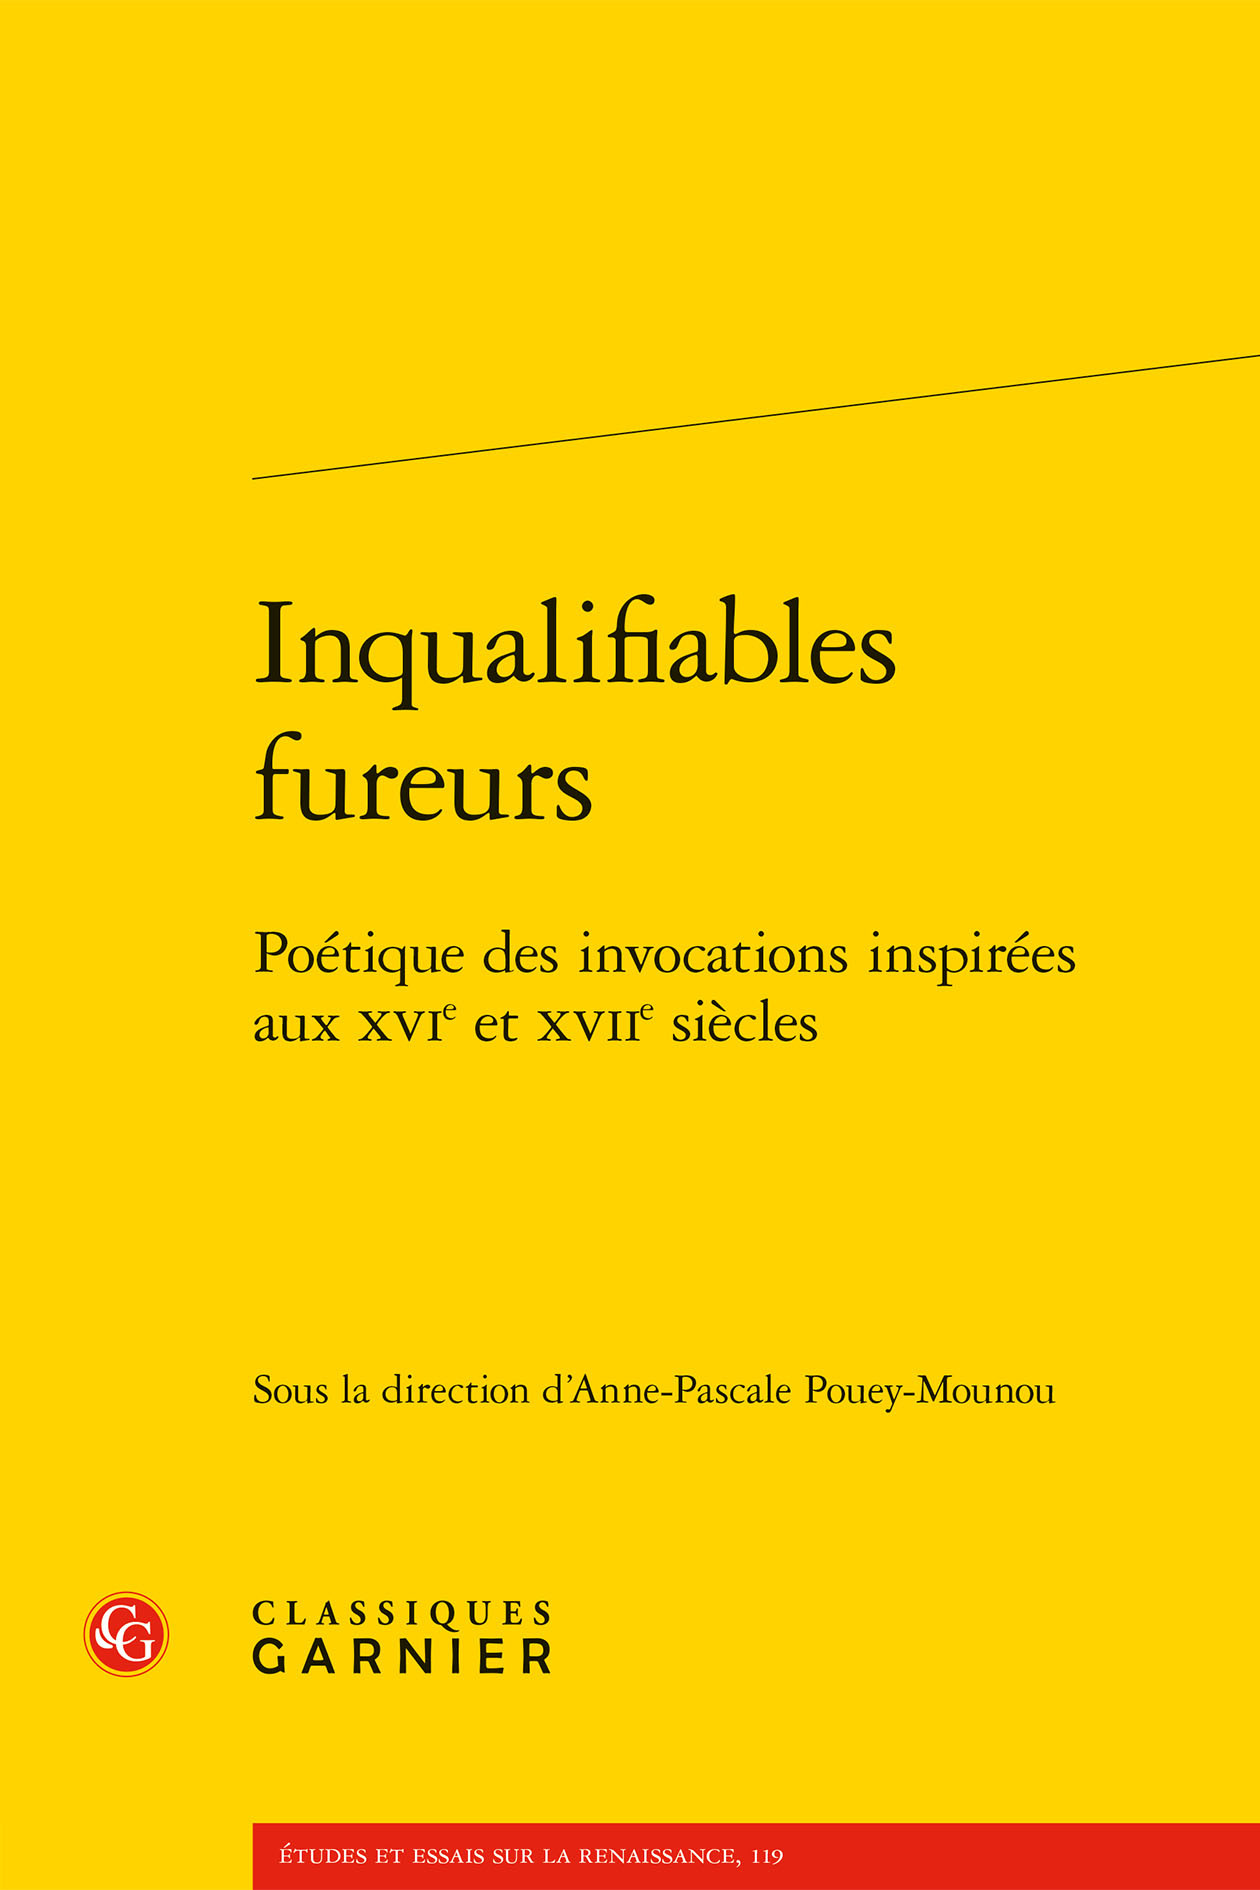 INQUALIFIABLES FUREURS - POETIQUE DES INVOCATIONS INSPIREES AUX XVIE ET XVIIE SI - POETIQUE DES INVO